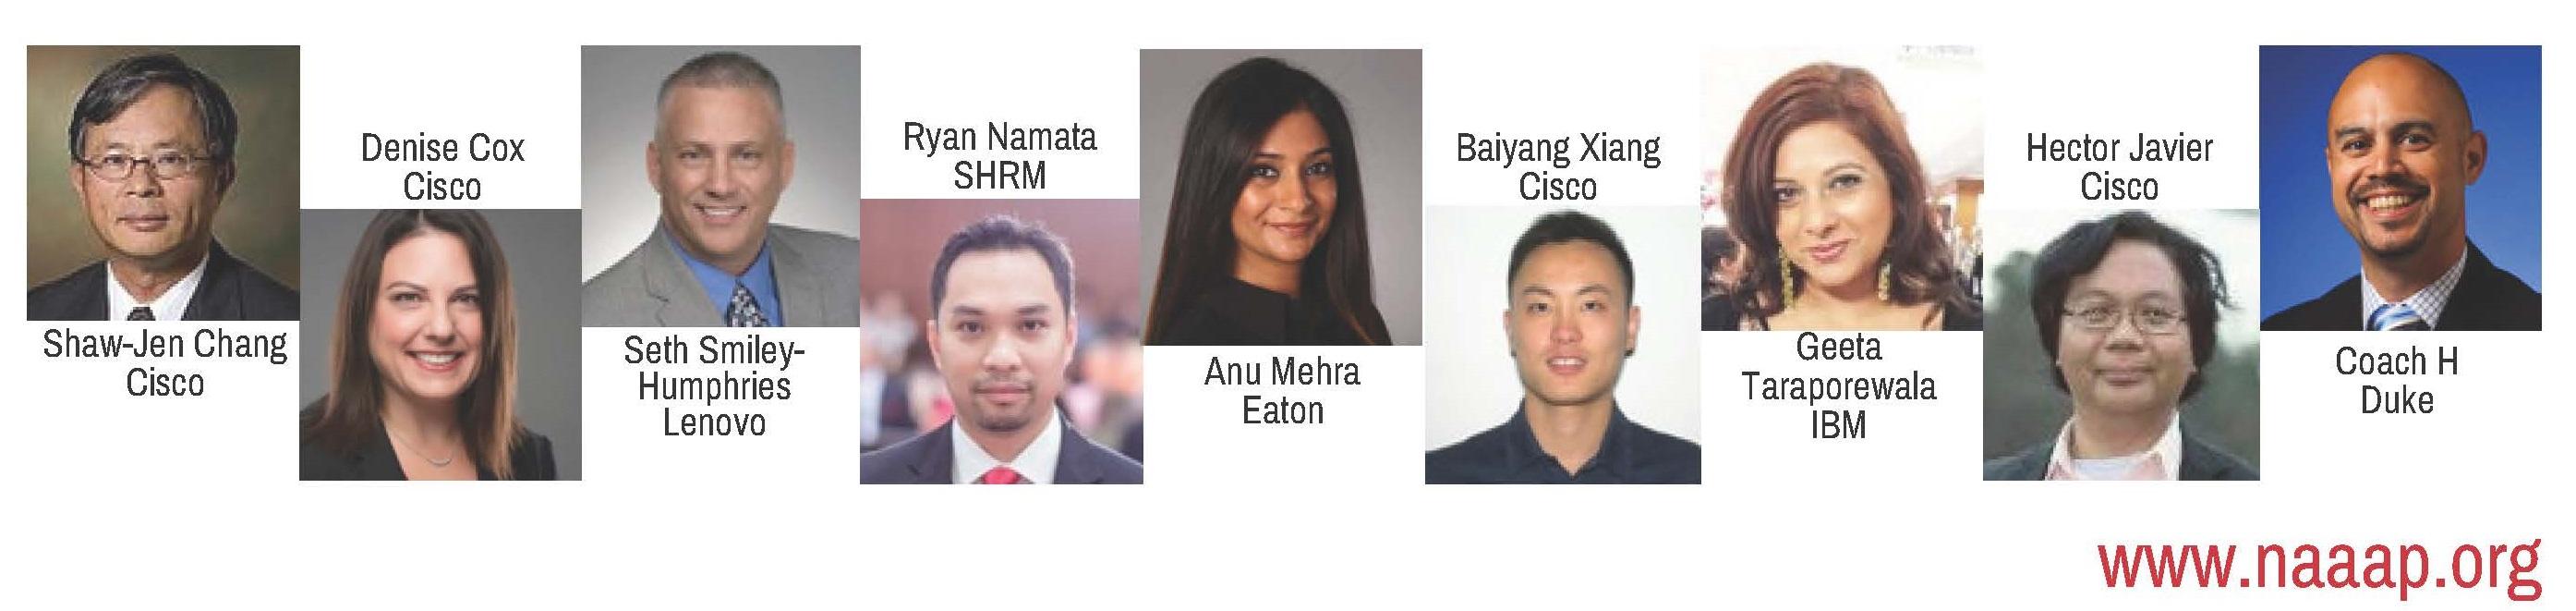 headshots of NAAAP ERG Summit speakers